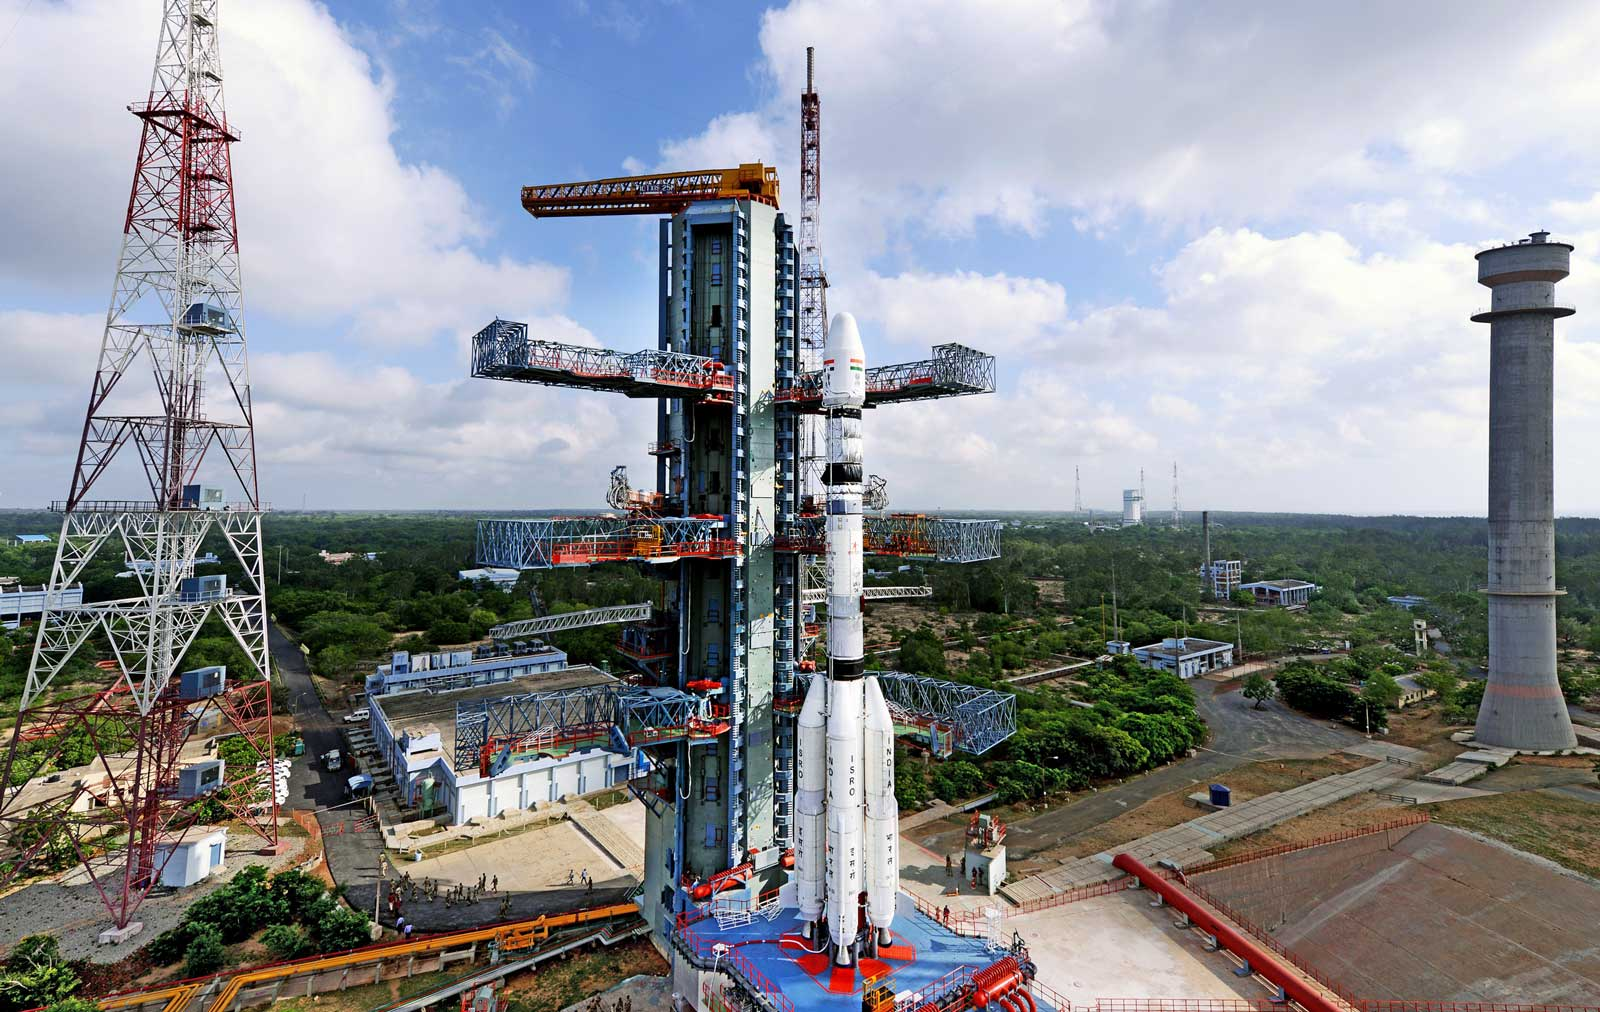 gsat 6a communication satellite - 1024×714